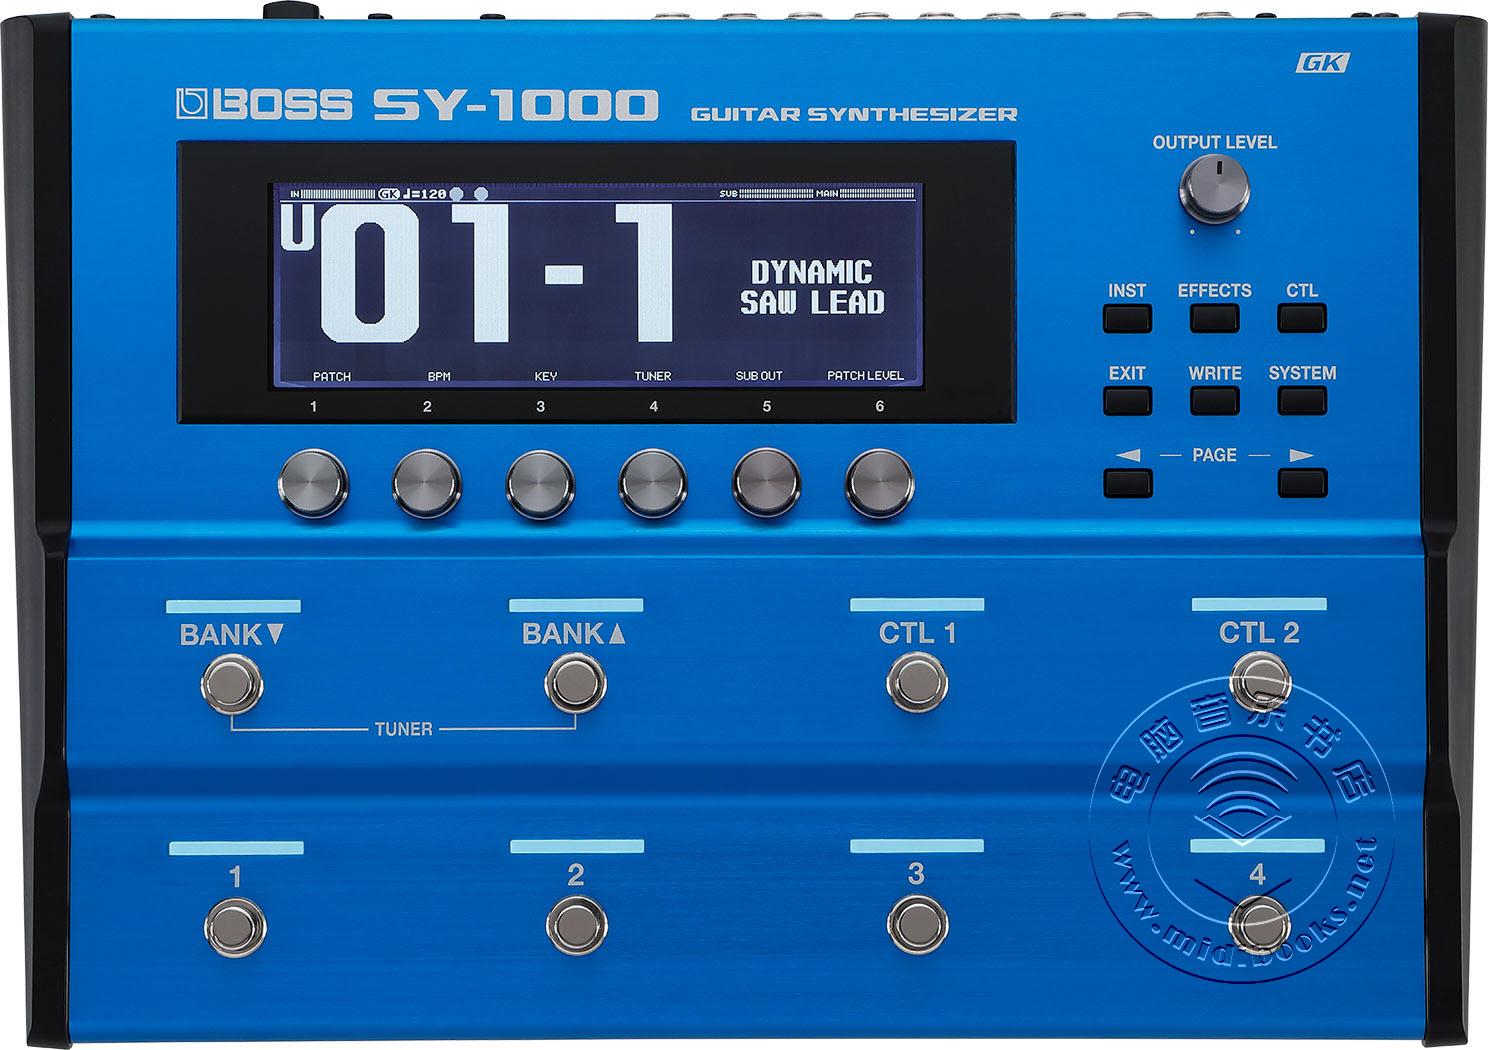 BOSS发布最新SY-1000吉他合成器